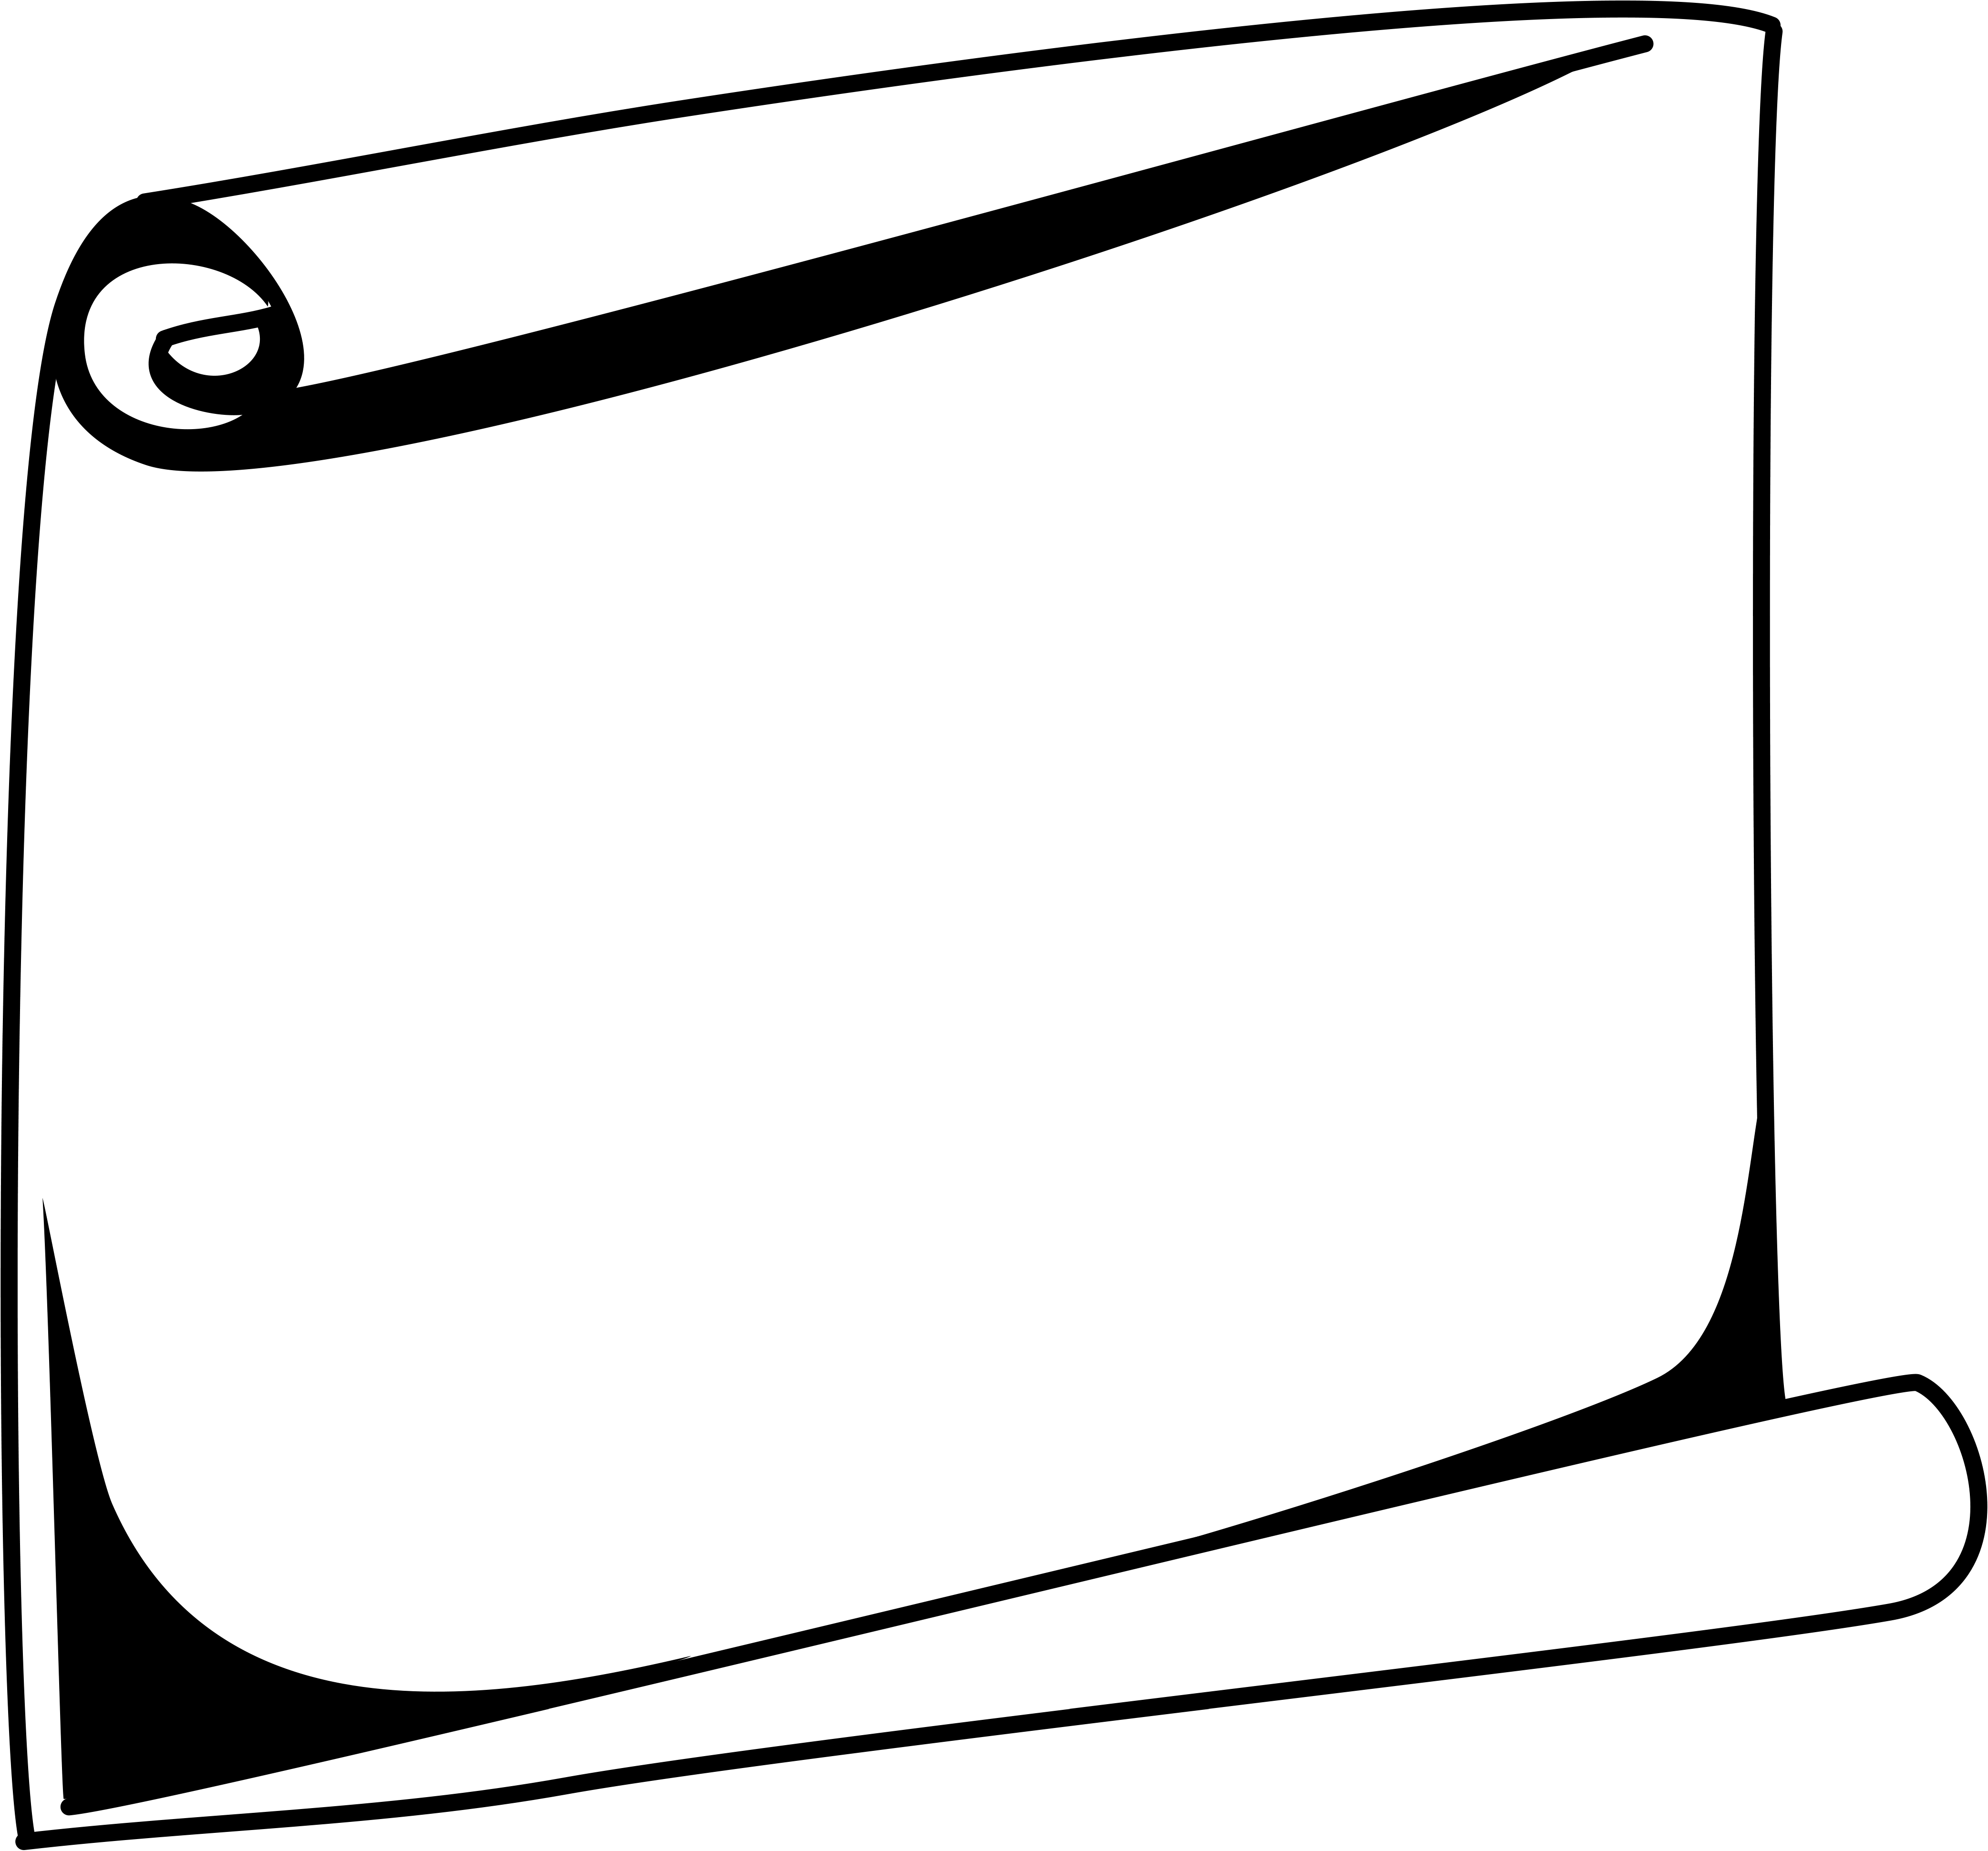 Free Scroll Border, Download Free Clip Art, Free Clip Art on.